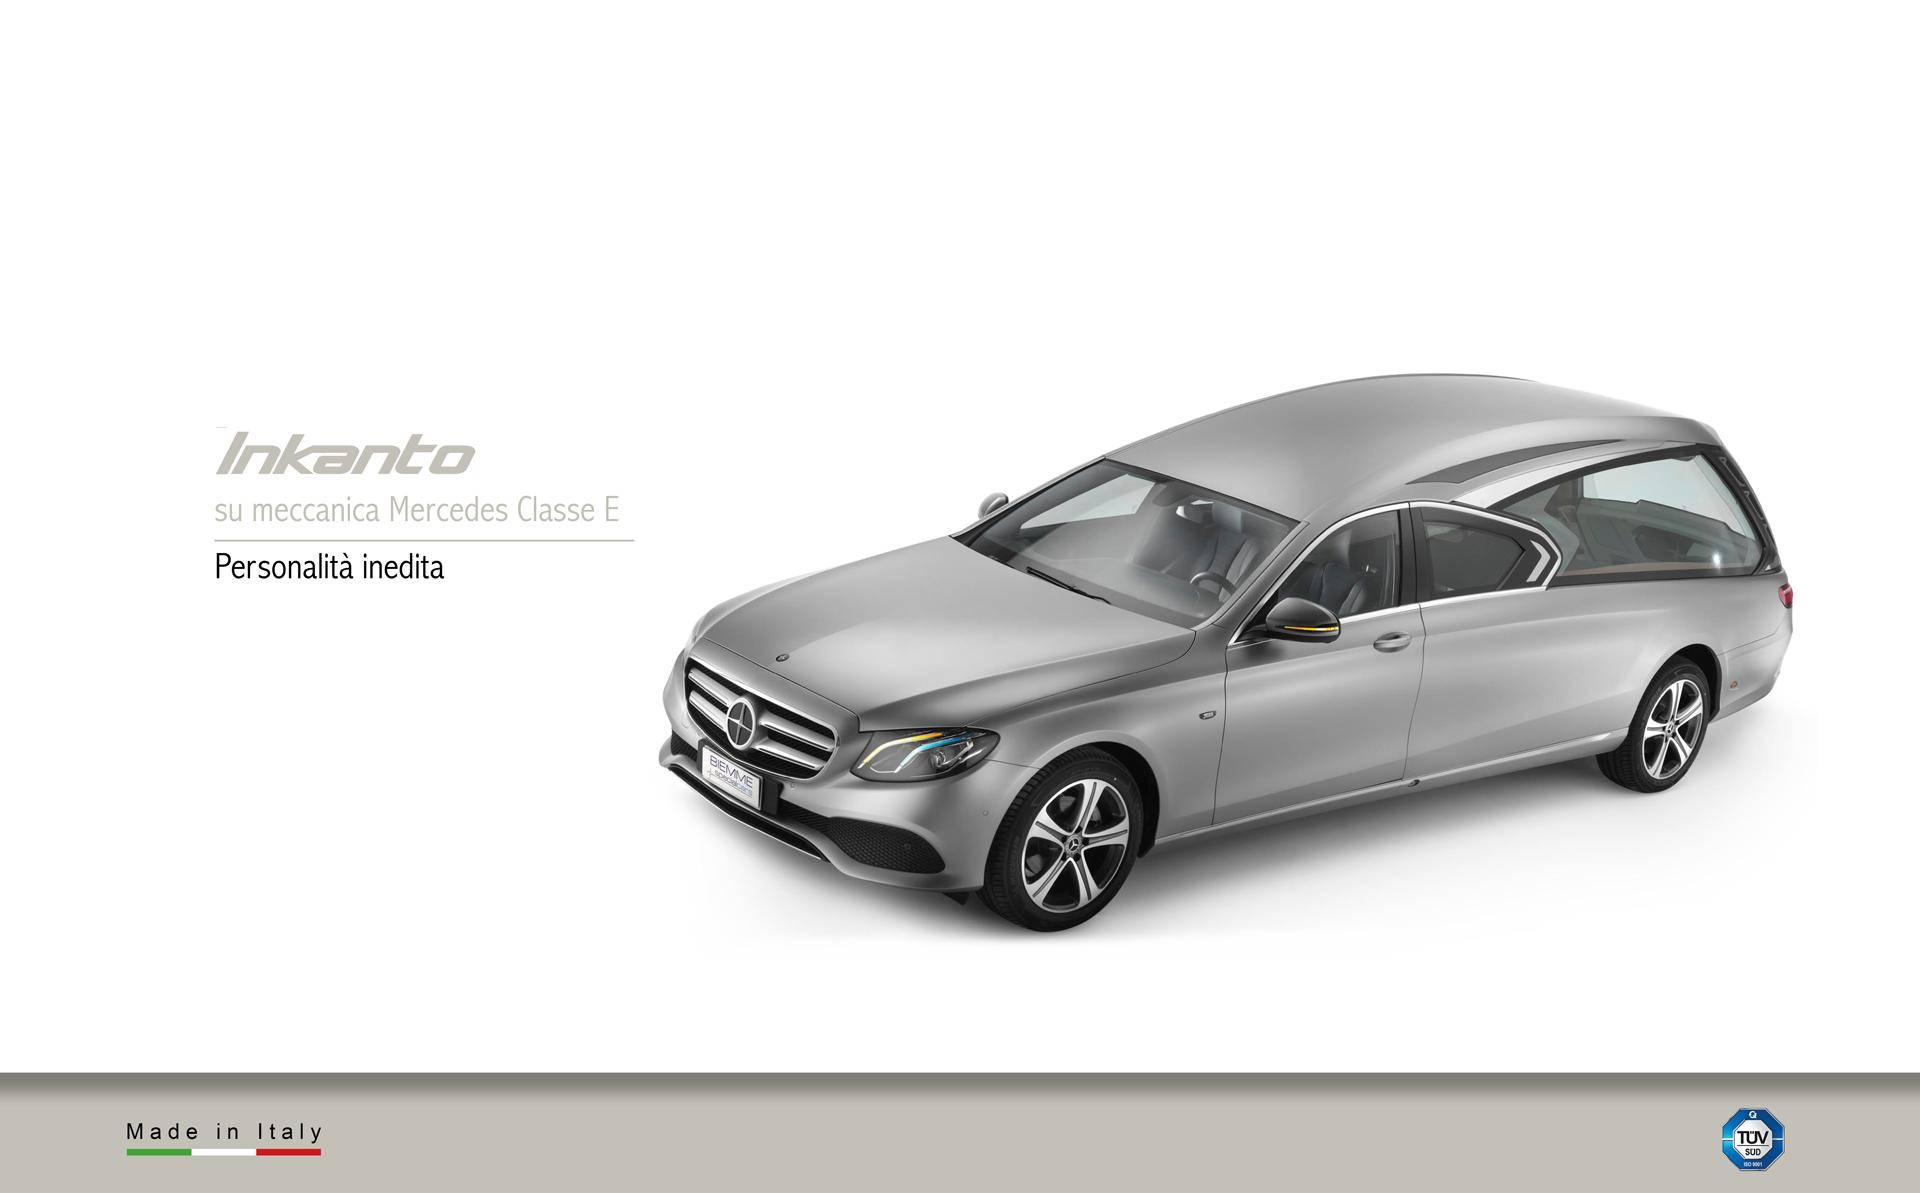 Hearse inkanto meccanical Mercedes Benz Classe E